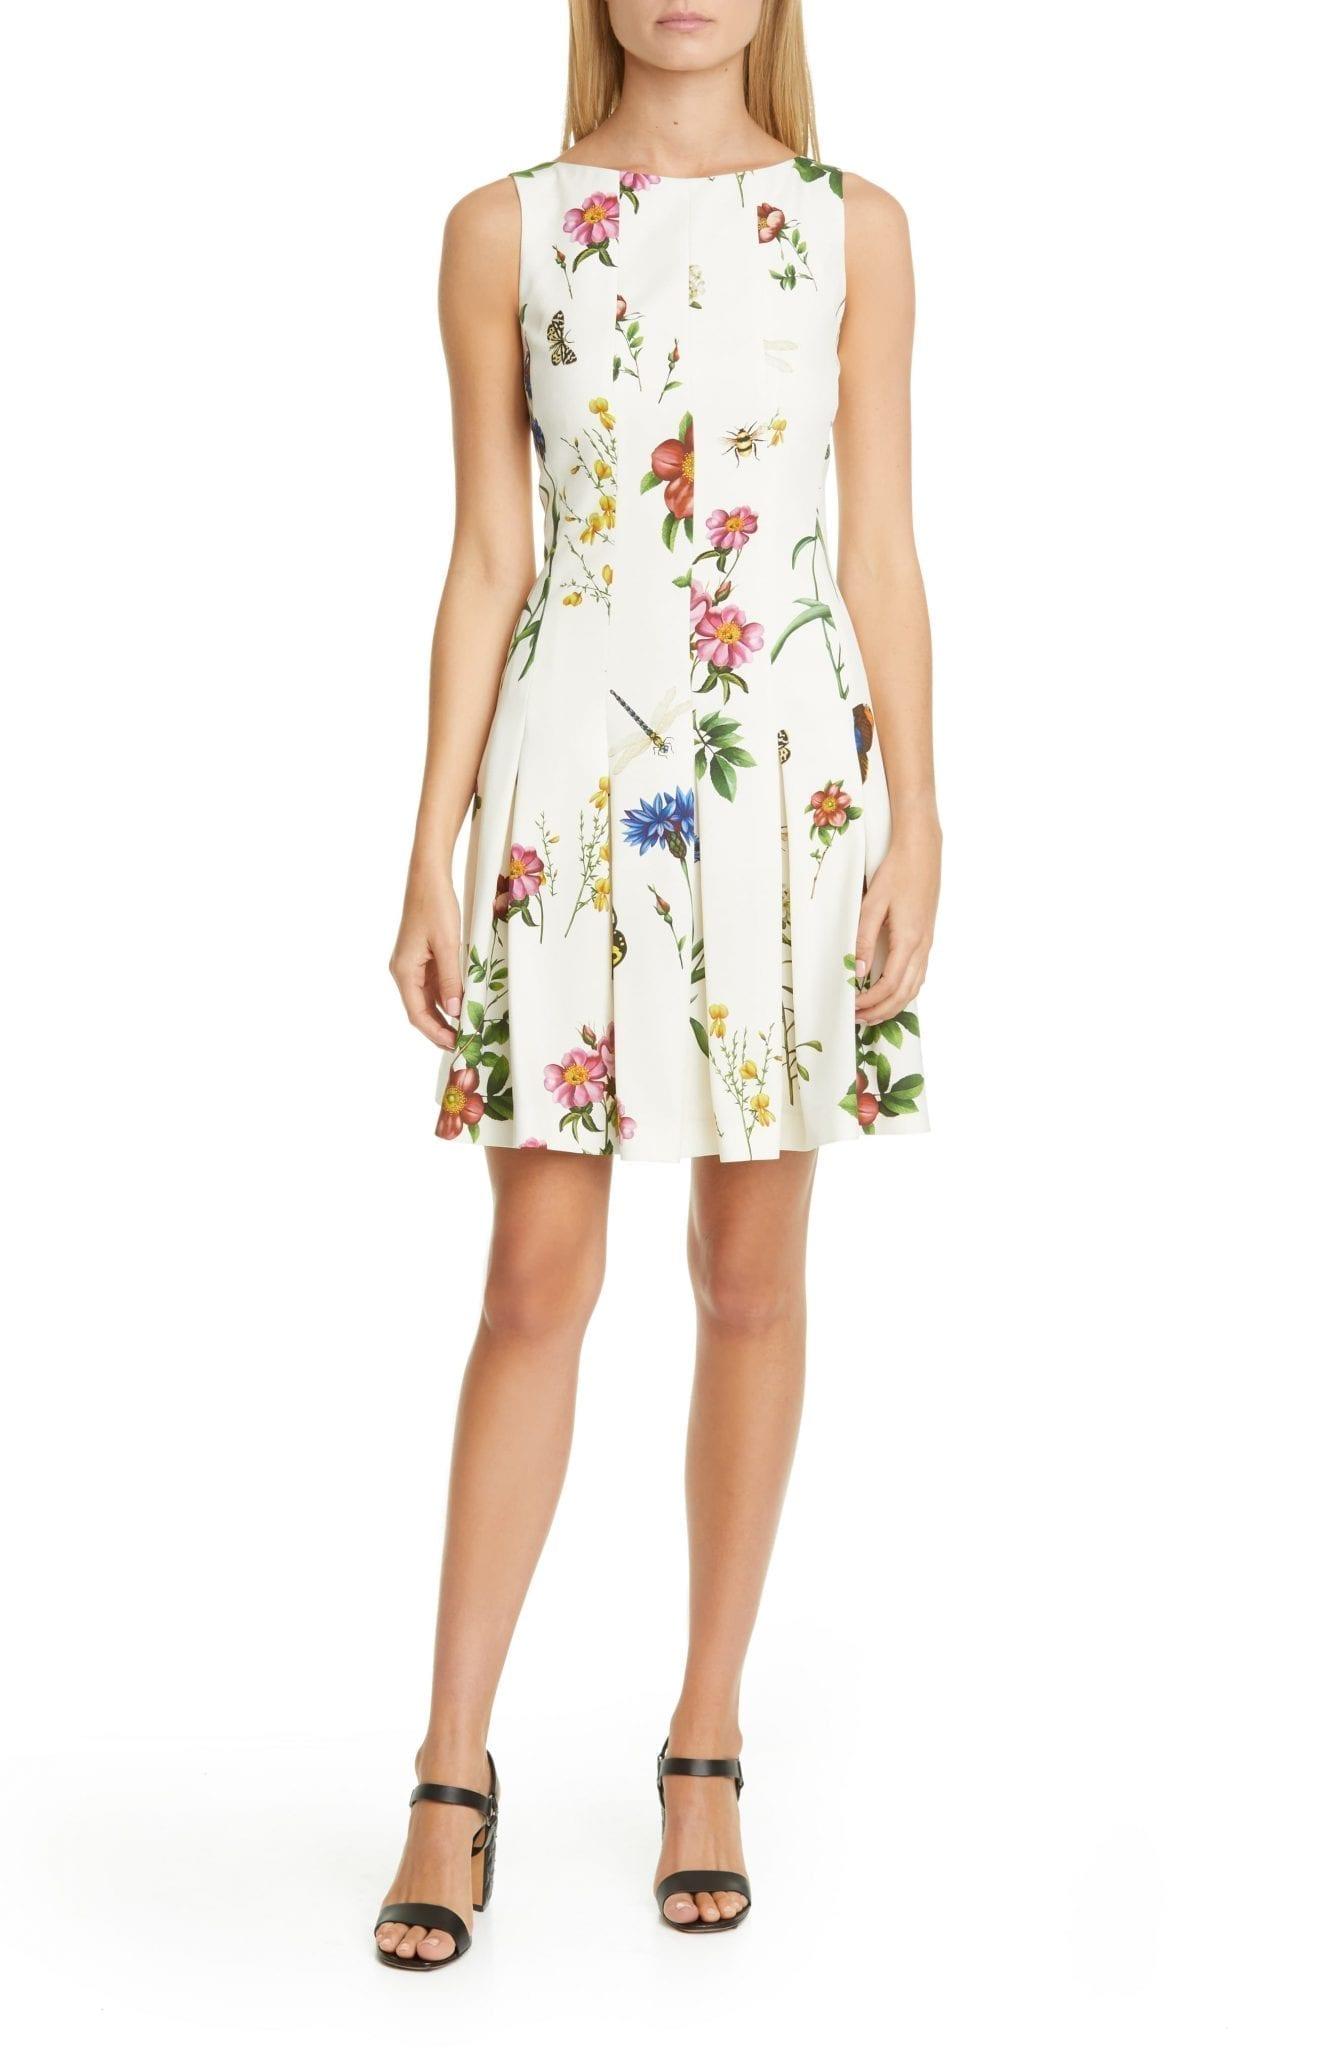 OSCAR DE LA RENTA Ladies Pleated Floral Mini Dress